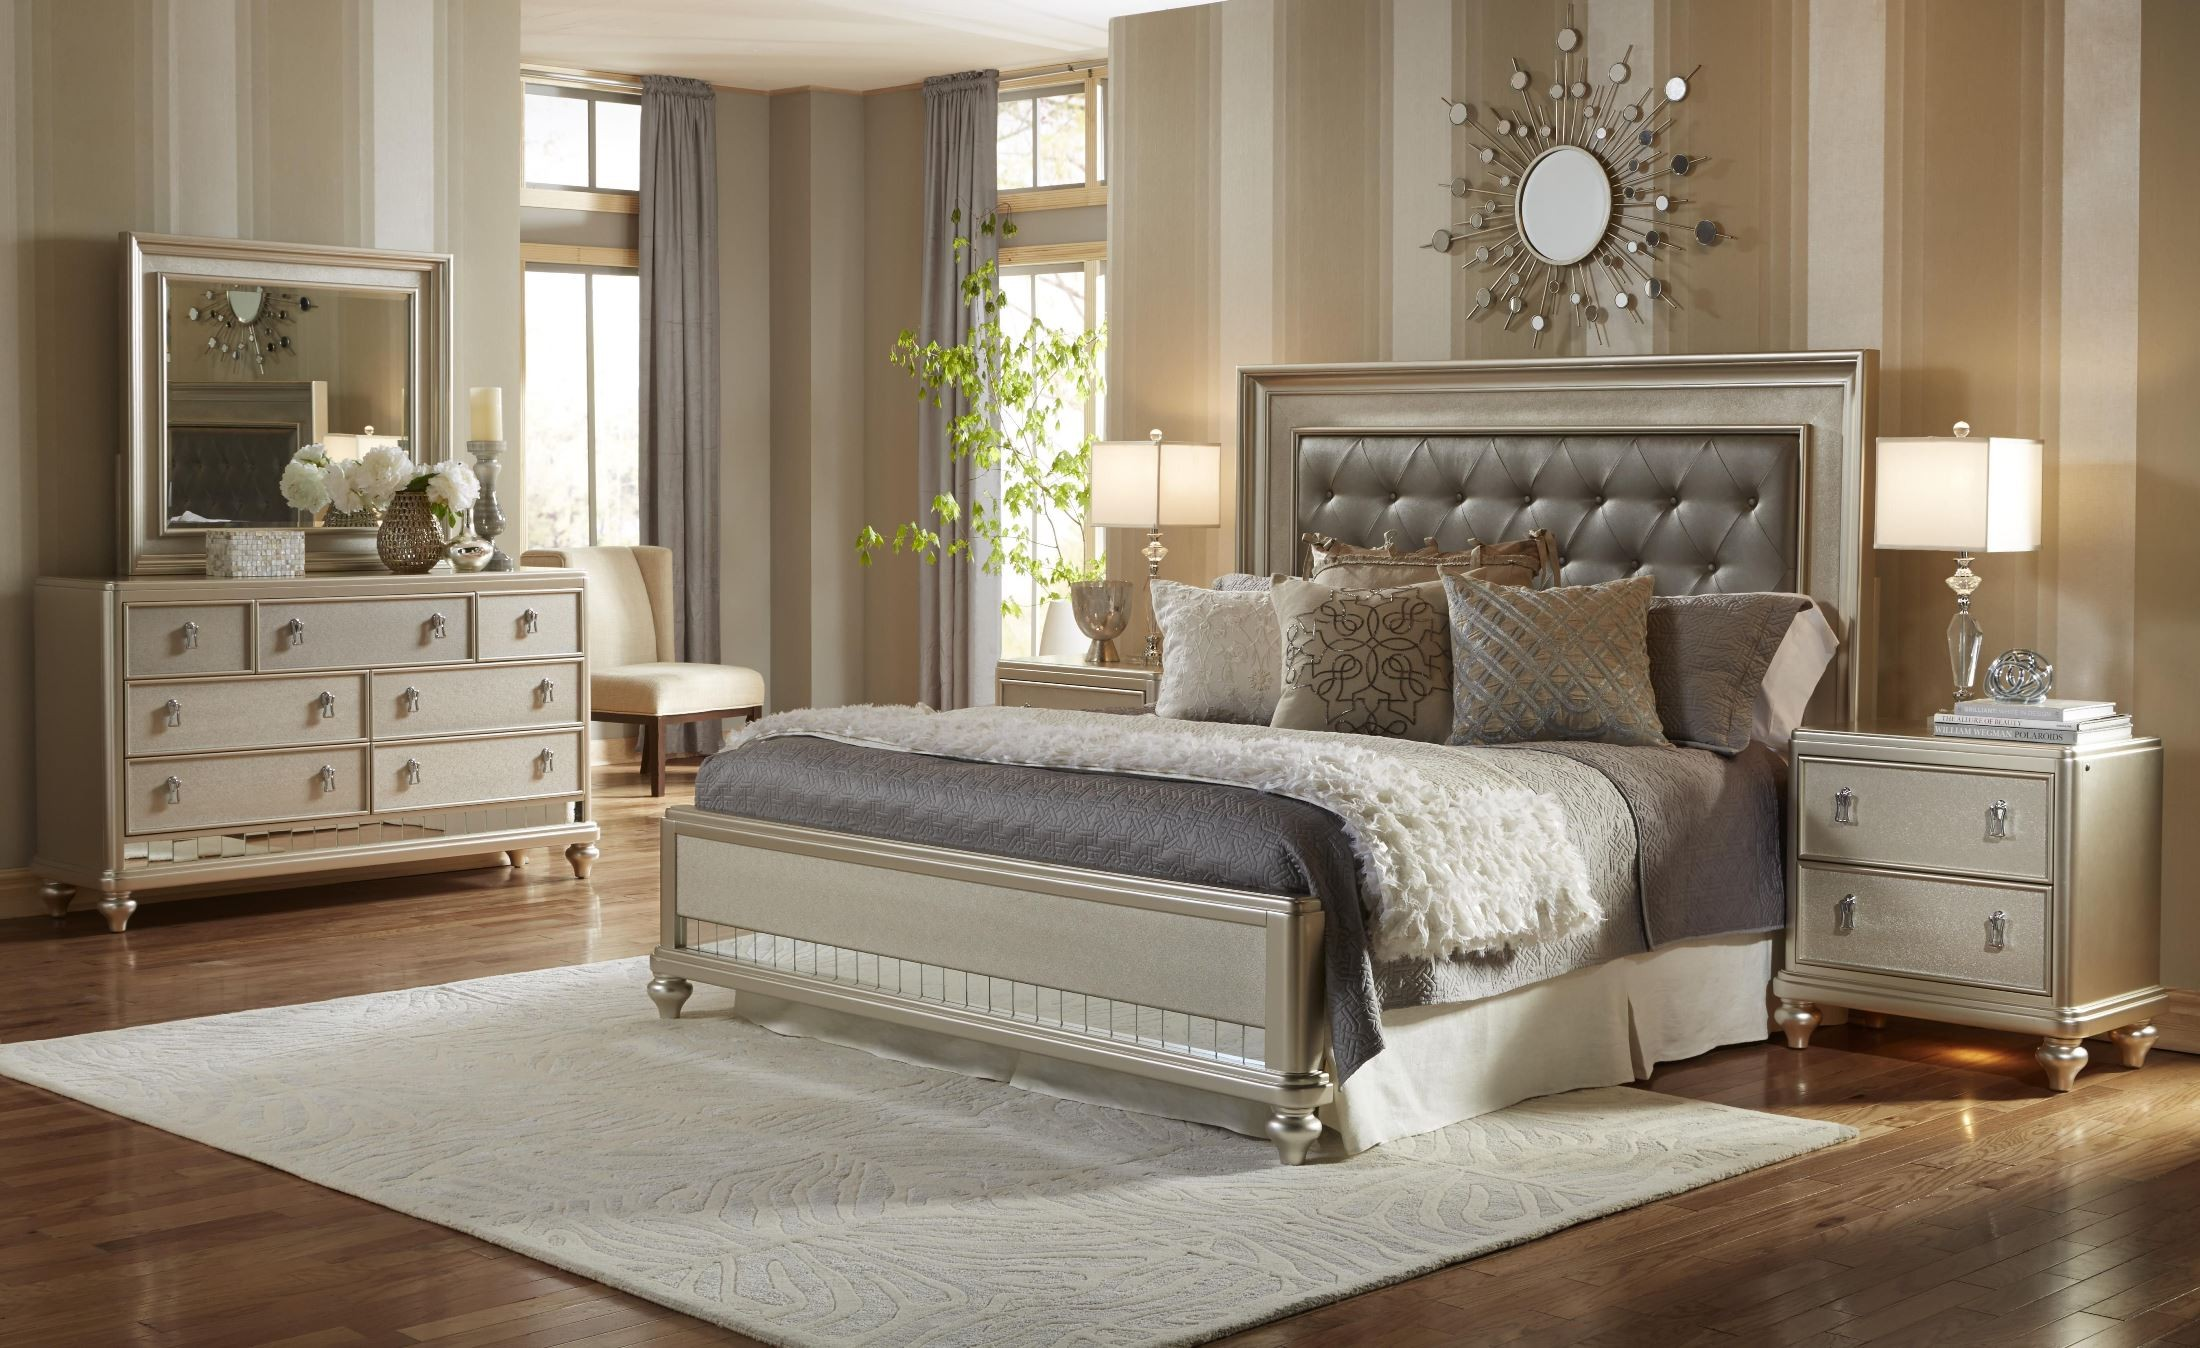 Diva Panel Bedroom Set from Samuel Lawrence (8808-255-257-400 ...